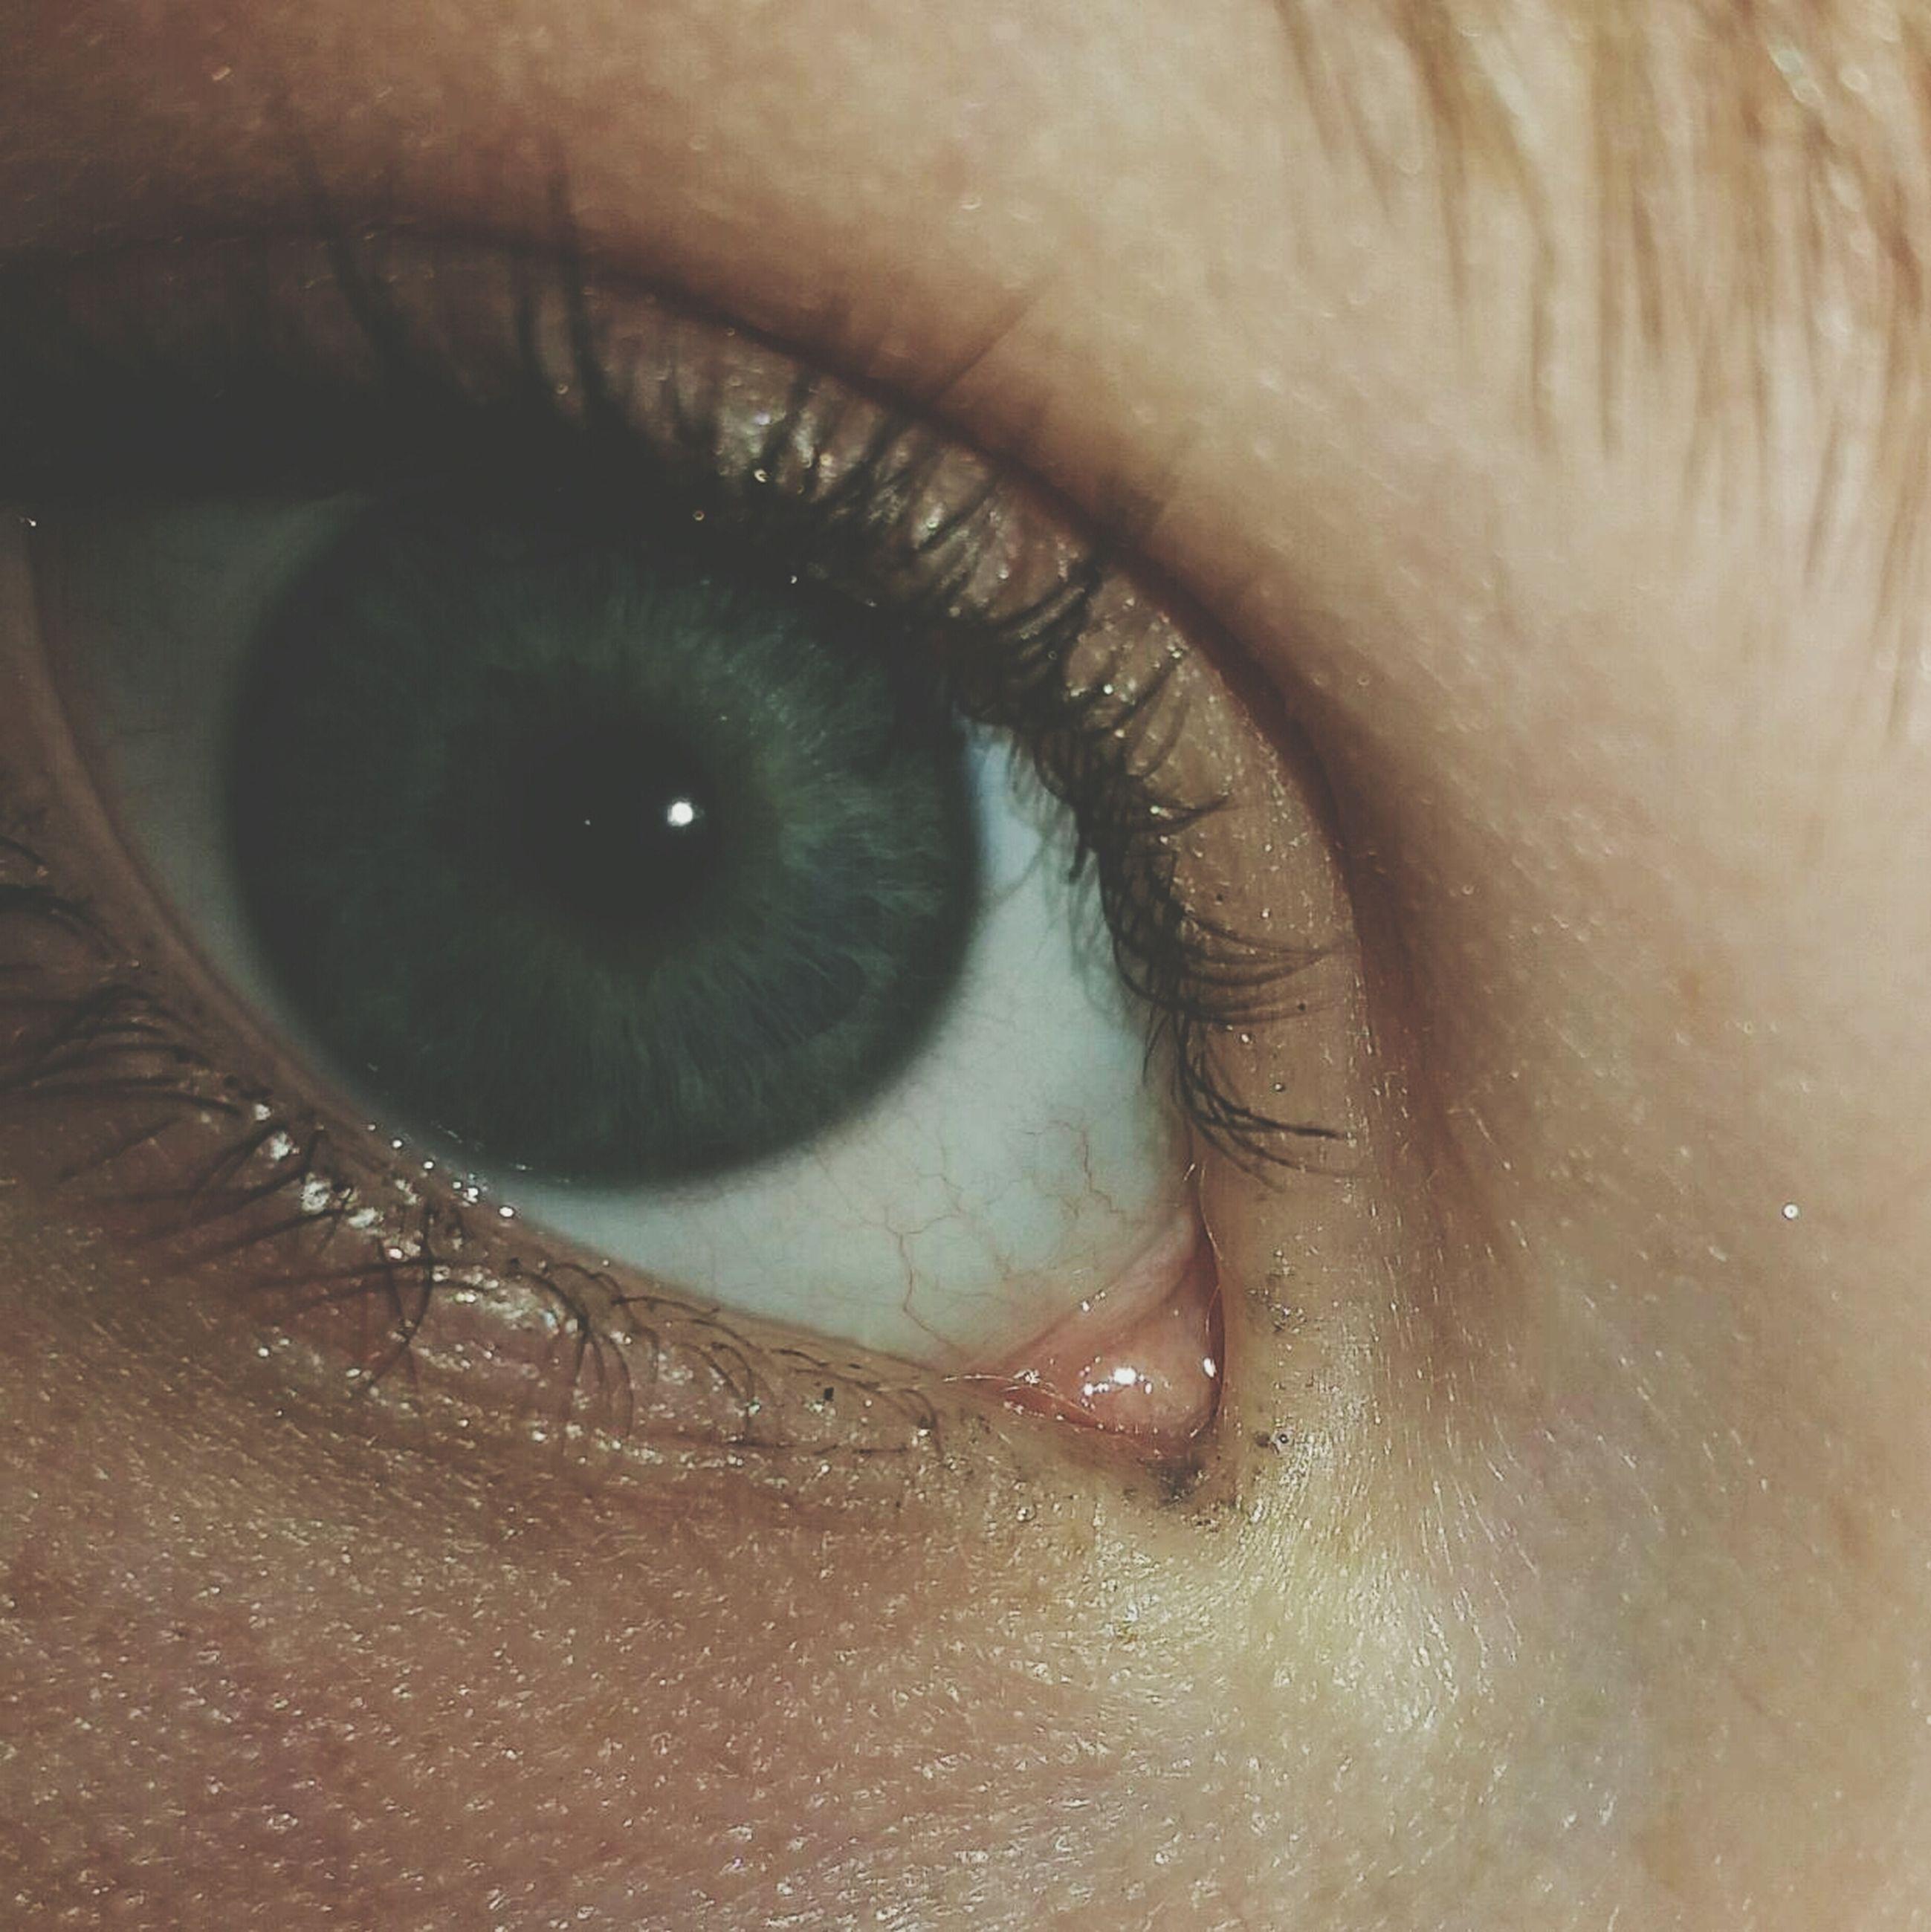 human eye, close-up, part of, eyelash, eyesight, human skin, person, sensory perception, lifestyles, unrecognizable person, extreme close-up, cropped, eyeball, human face, indoors, iris - eye